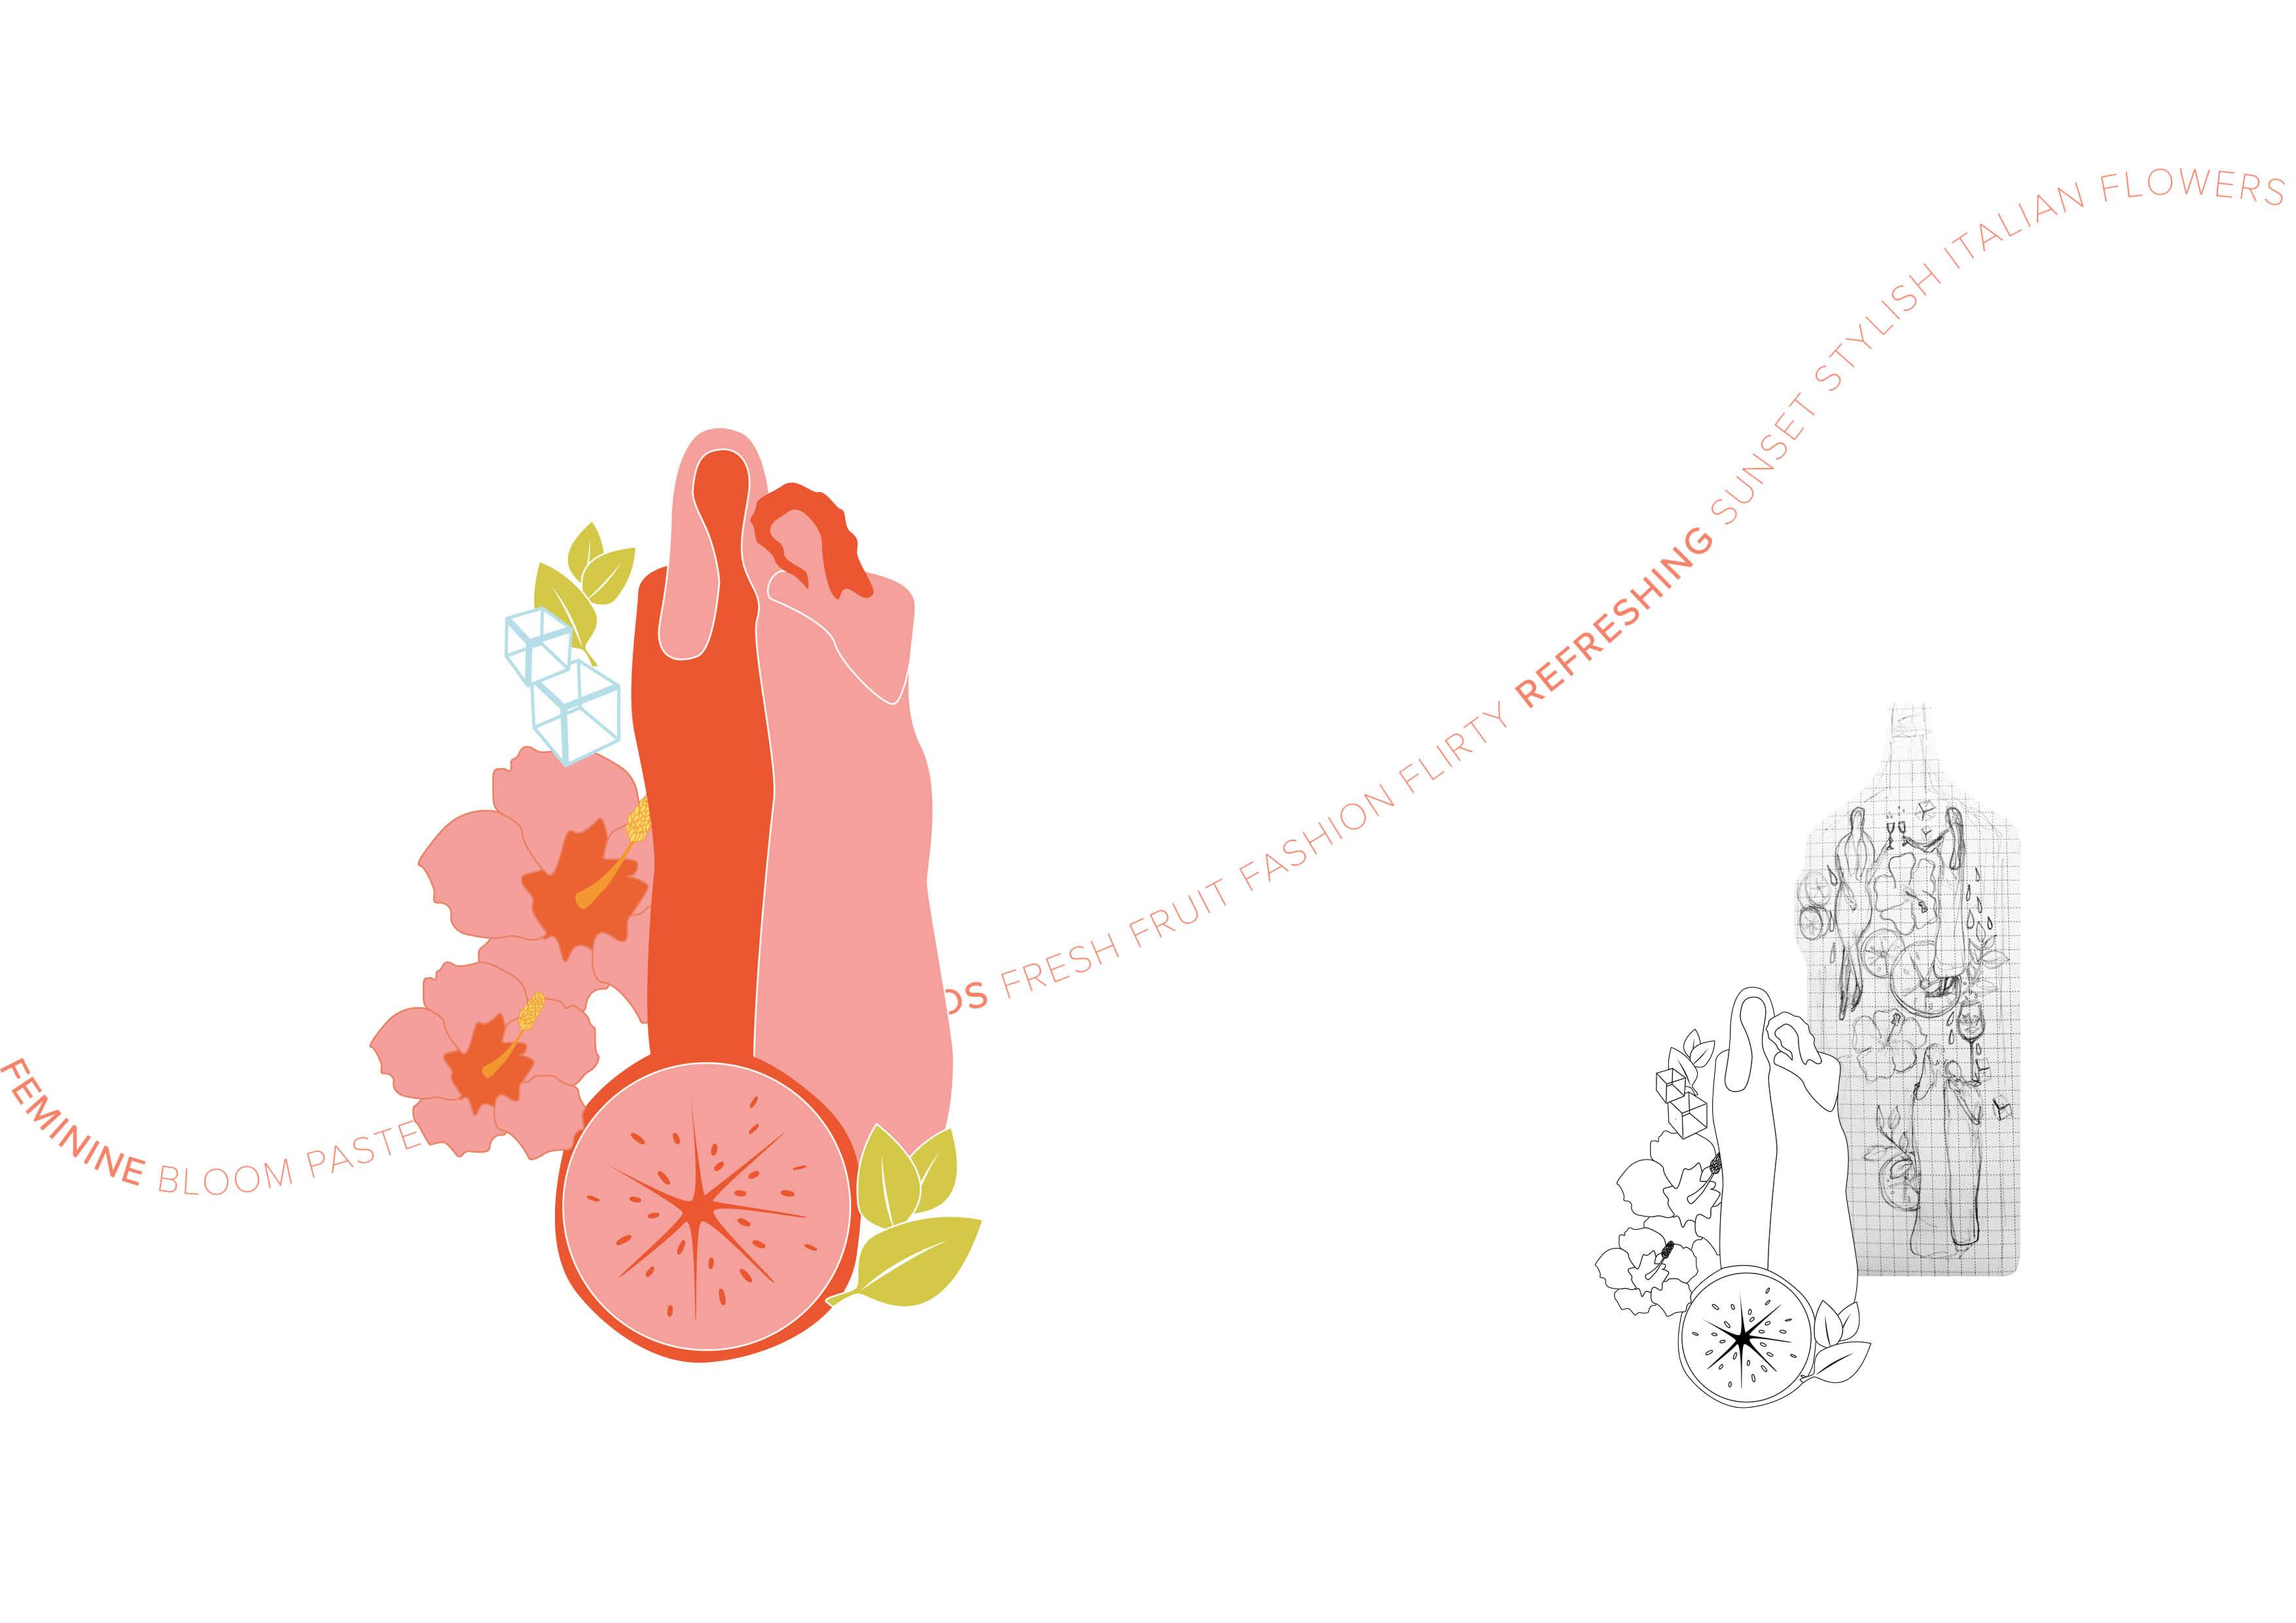 Ramazzotti Aperitivo Rosato Packaging Design (Process) by Magdalena Weiss